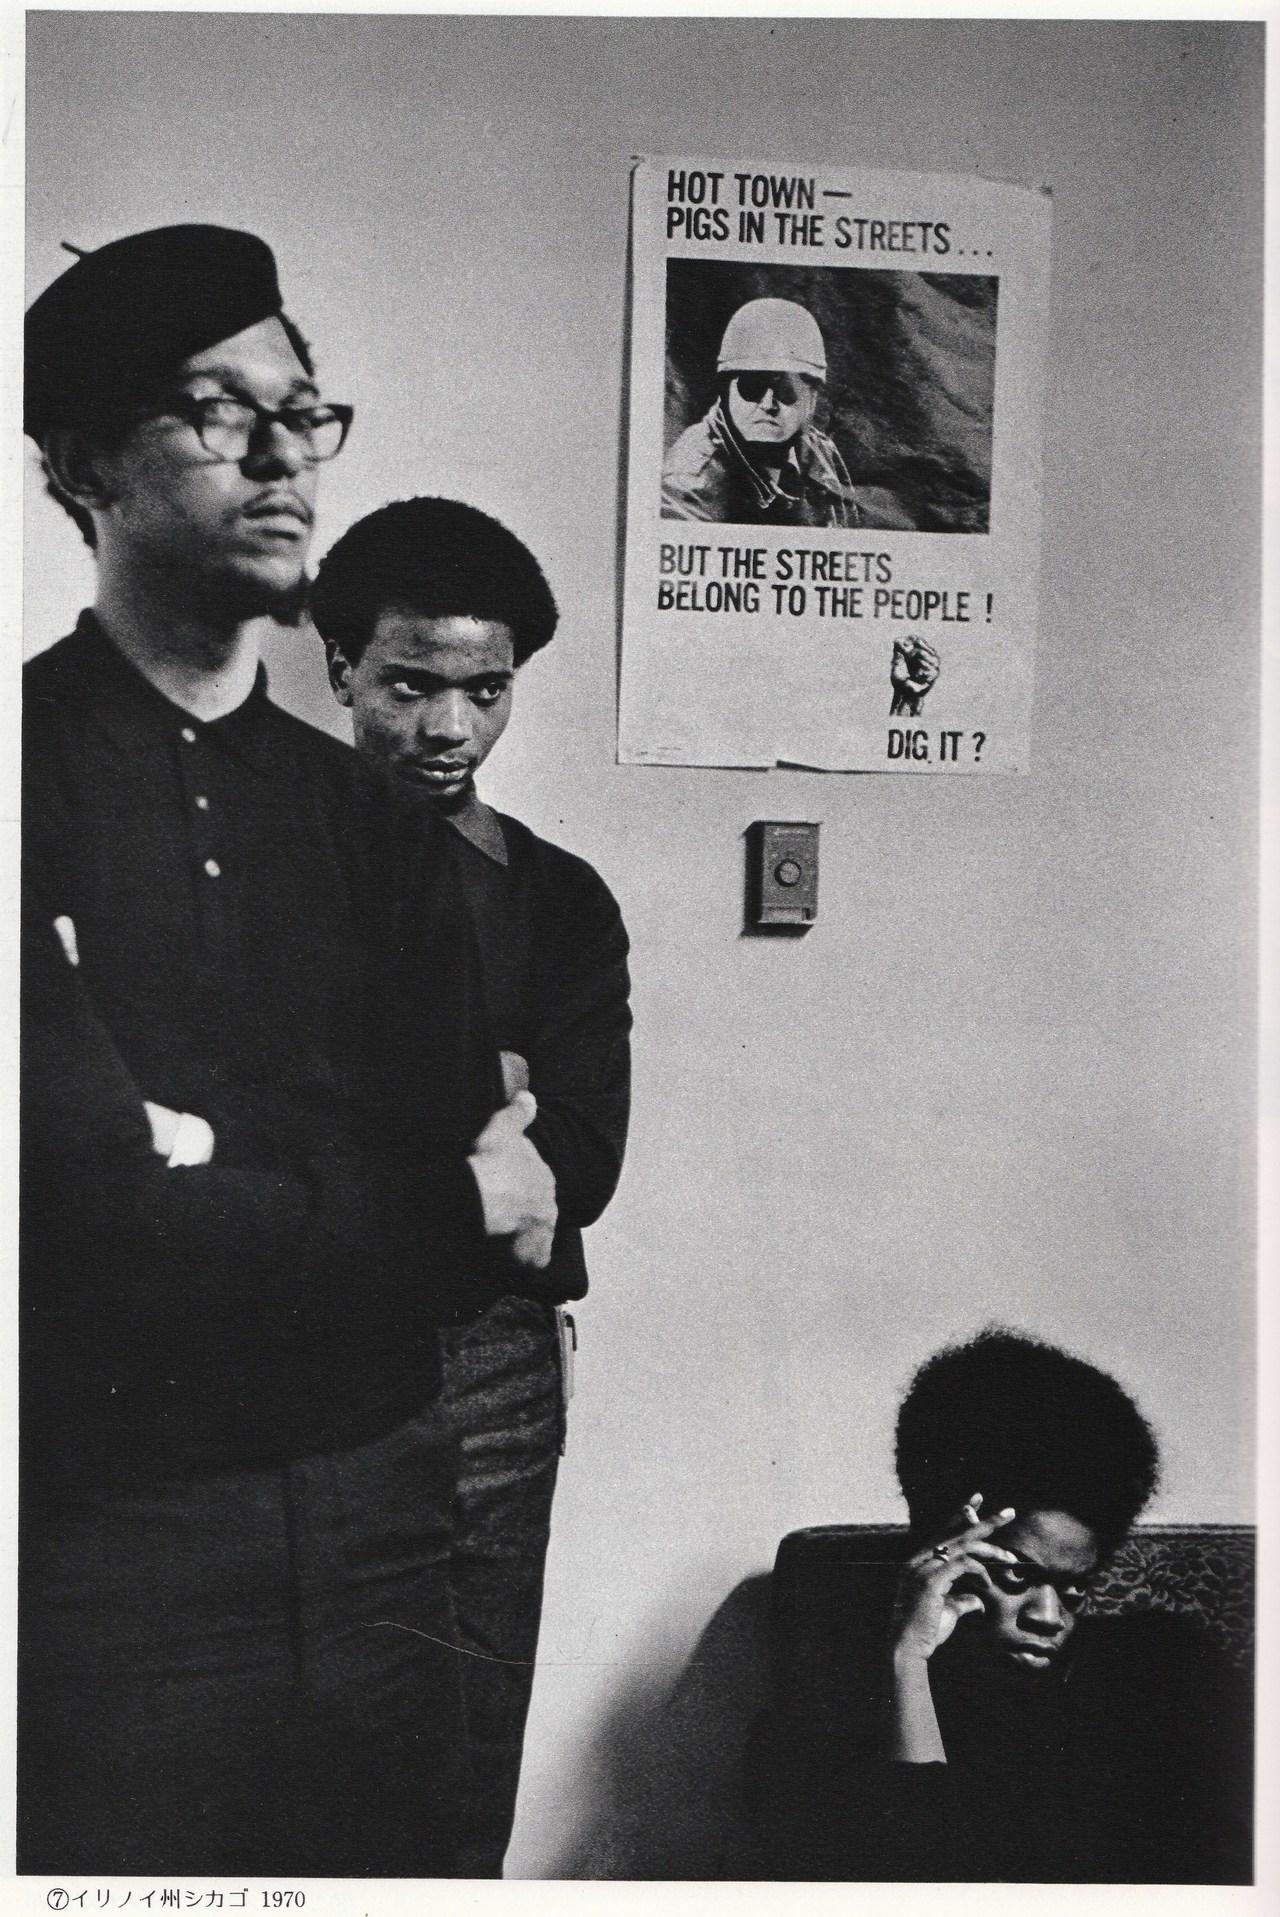 tsun-zaku: アメリカン・ピープル:久保田博二 イリノイ州シカゴ 1970 カメラ毎日1976年7月号 http://anamon.net/?pid=71513932 Look at us.